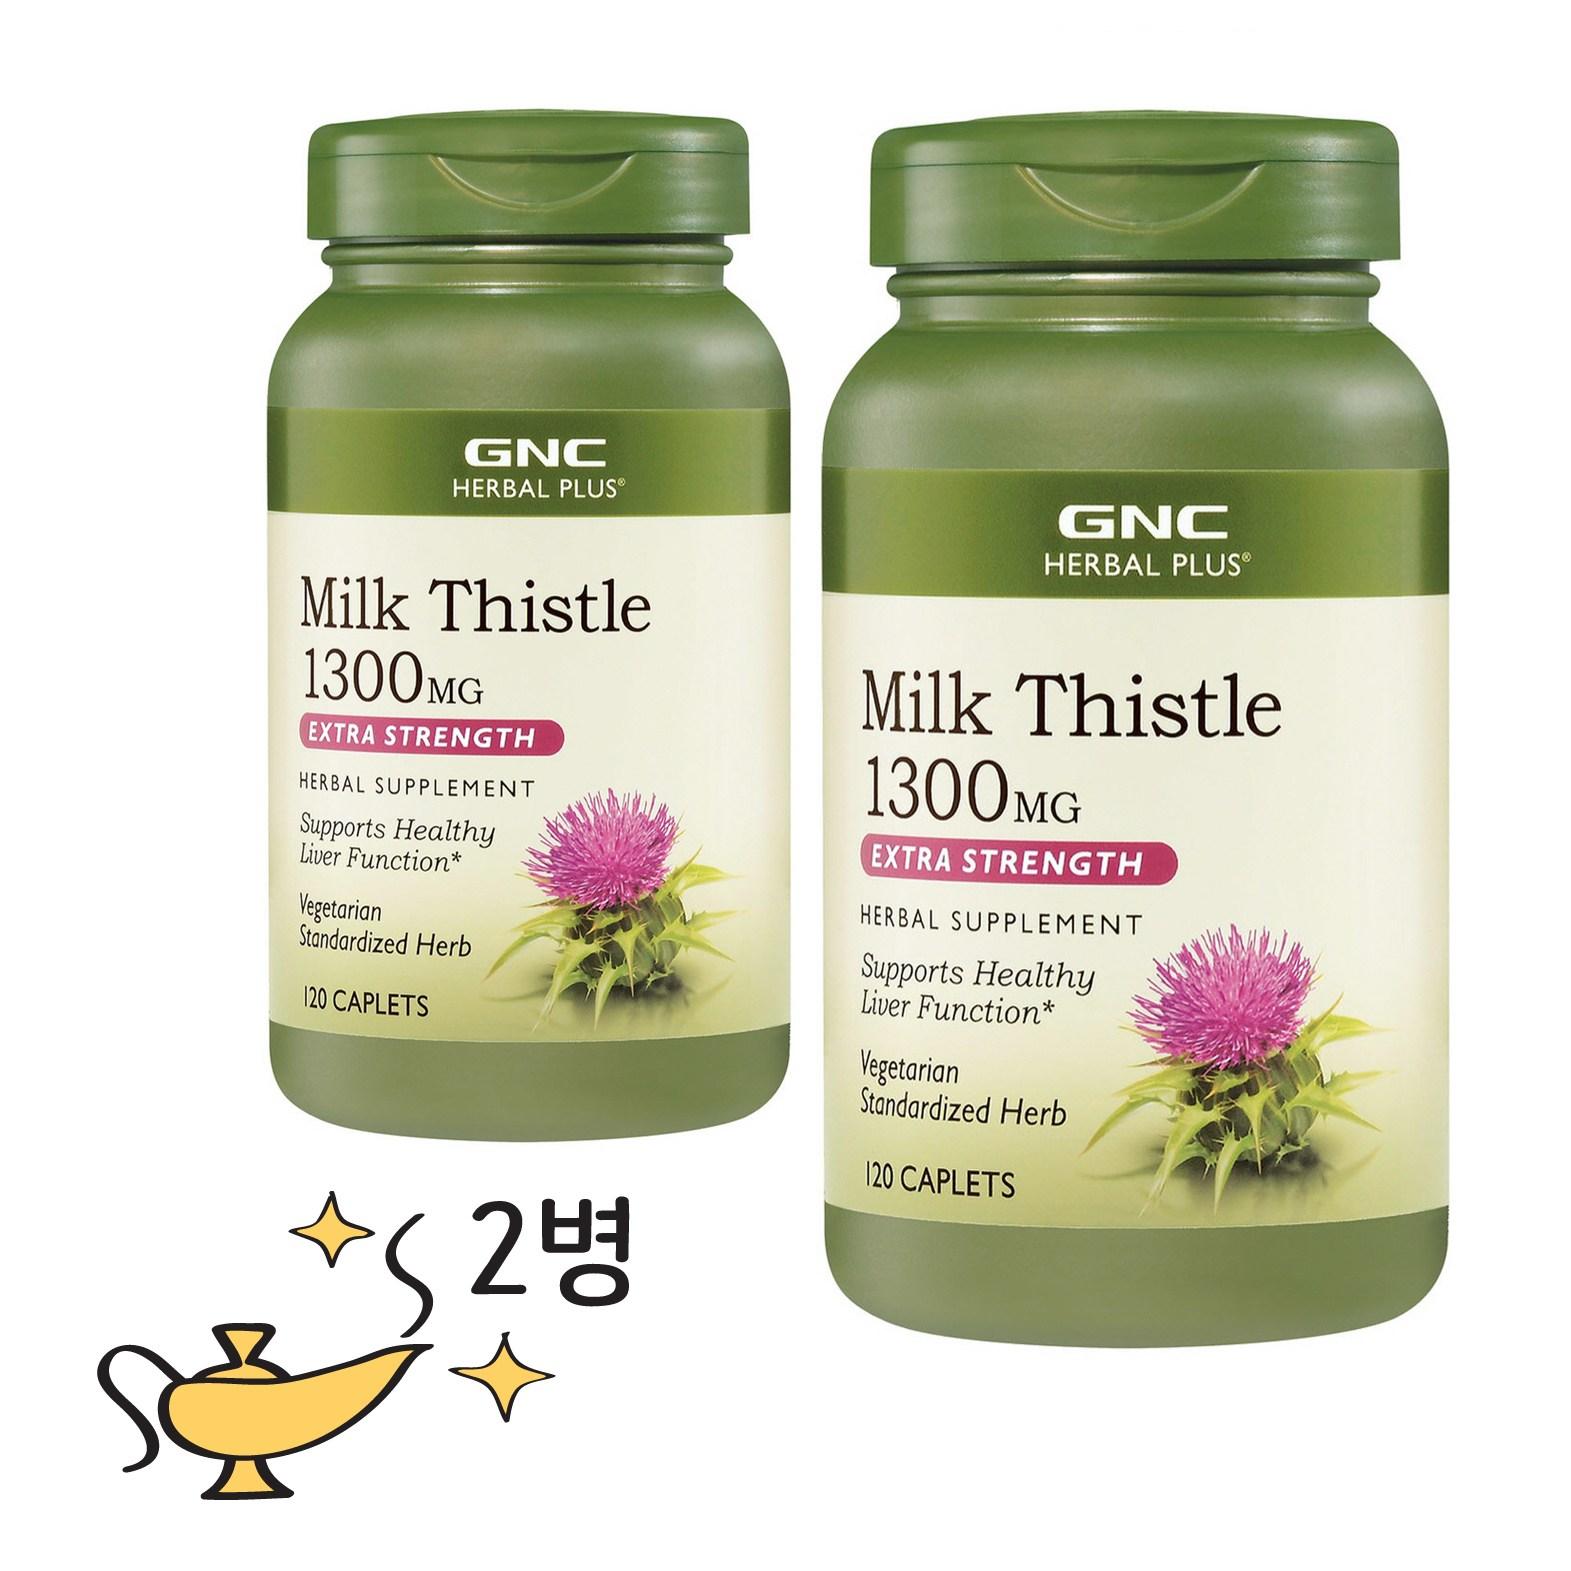 GNC [2병] 밀크시슬 1300mg 120정 - Milk Thistle 120caplets x2, 2병